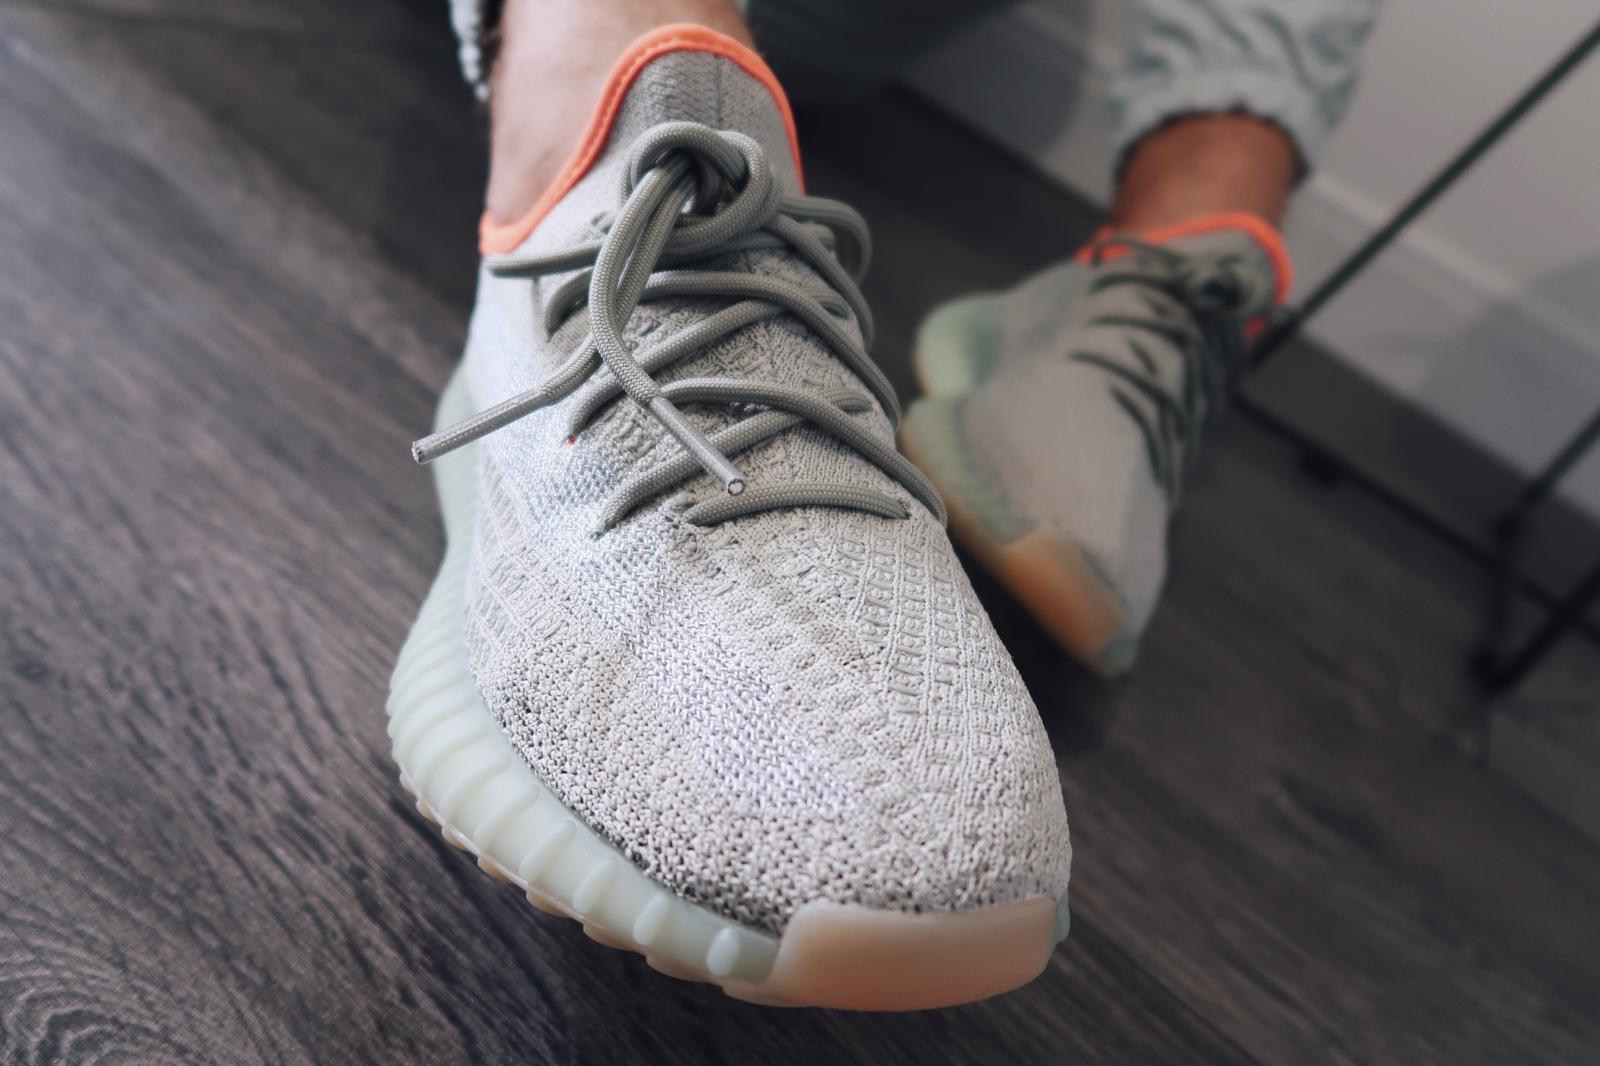 Sneaker_supplier_luke_mabbot_adidas_yeezy_350_v2_london_new_york_cyprus_2_trainer_2020